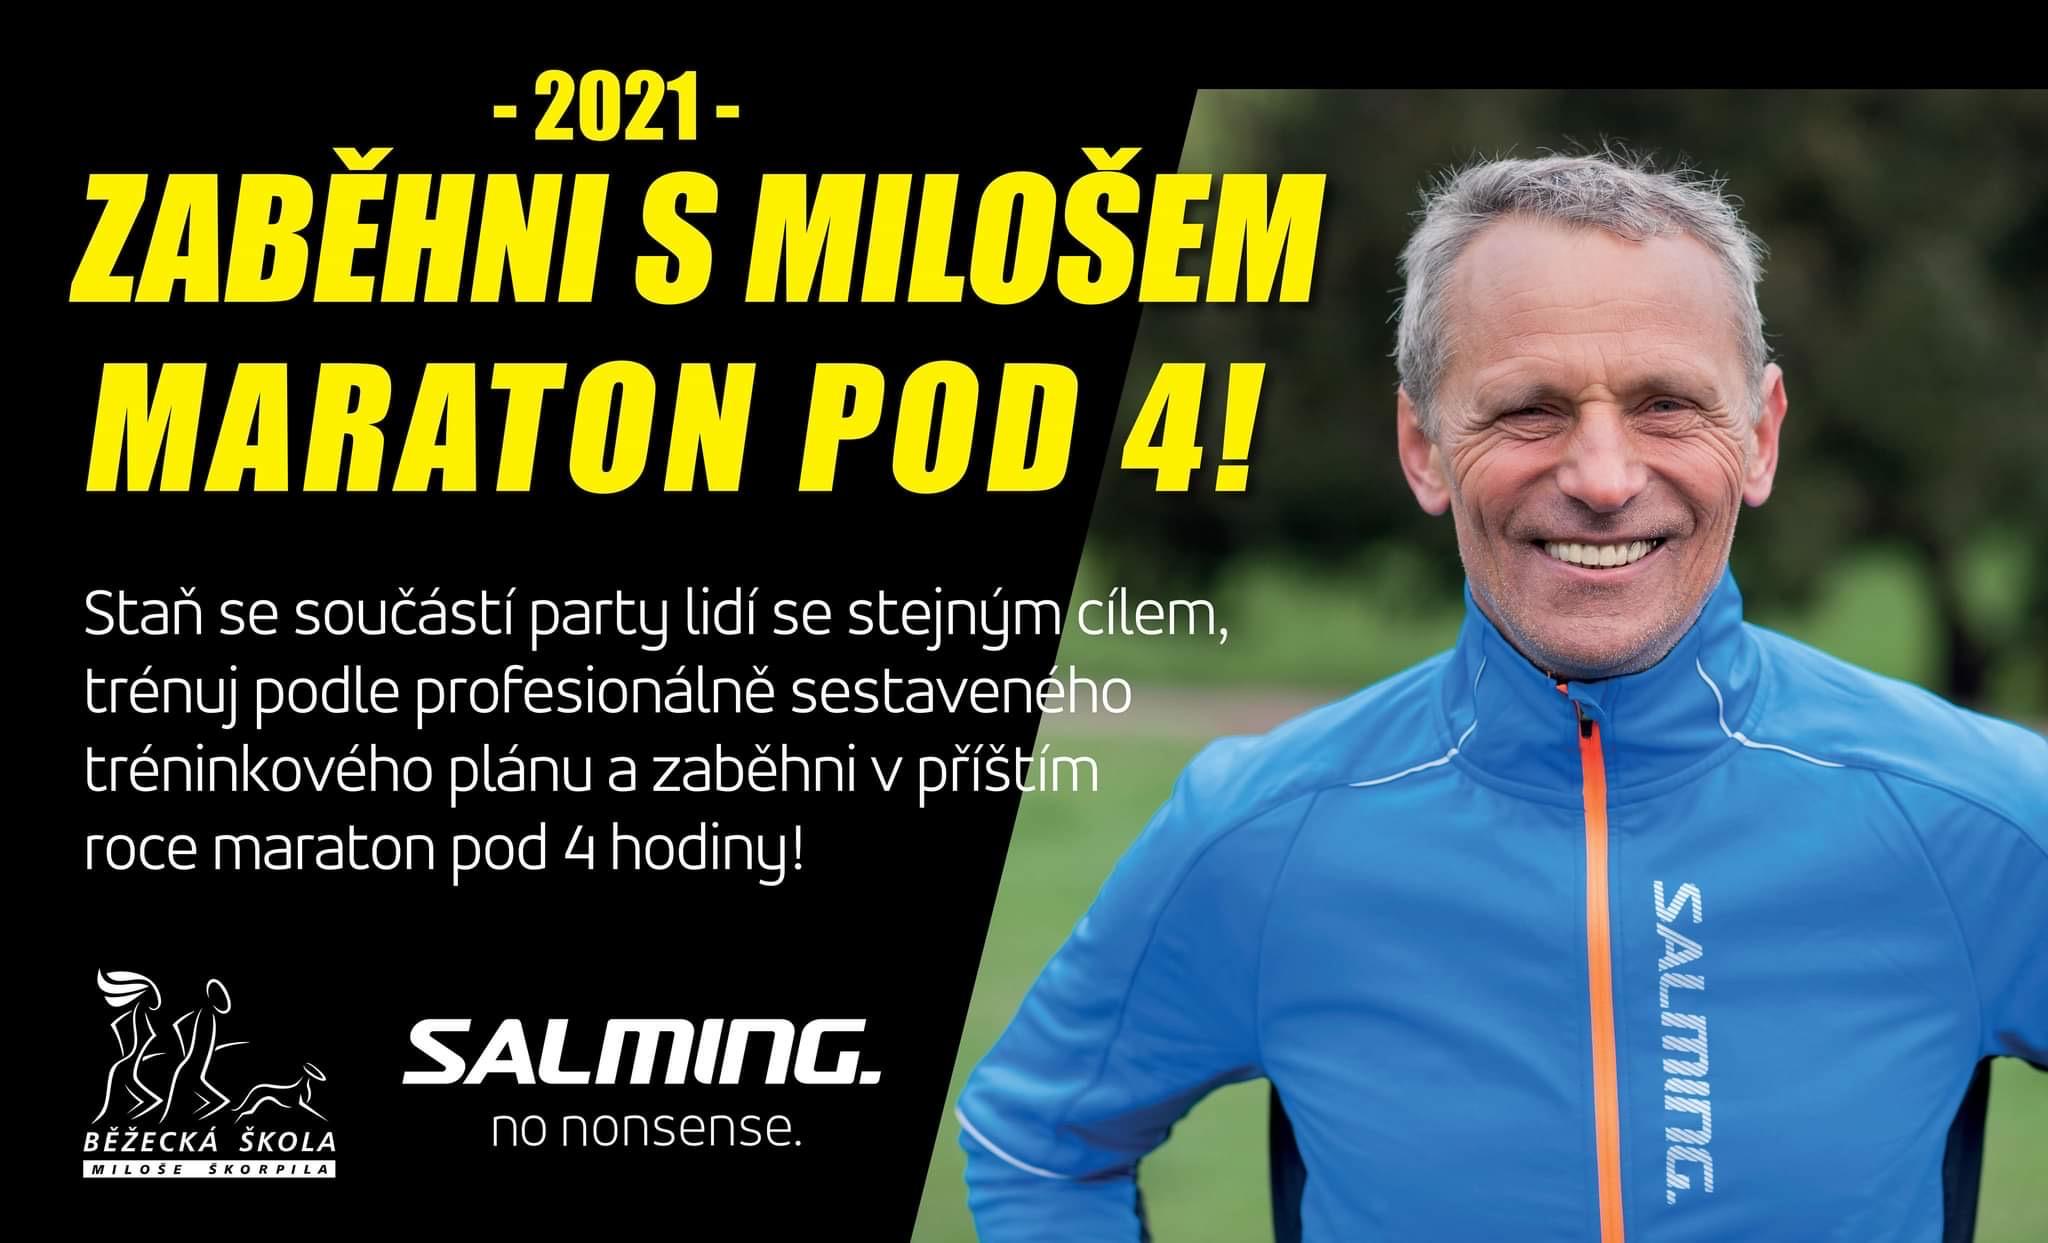 Maraton pod 4 s Milošem a Salmingem 2021. Zkusíme to jinak